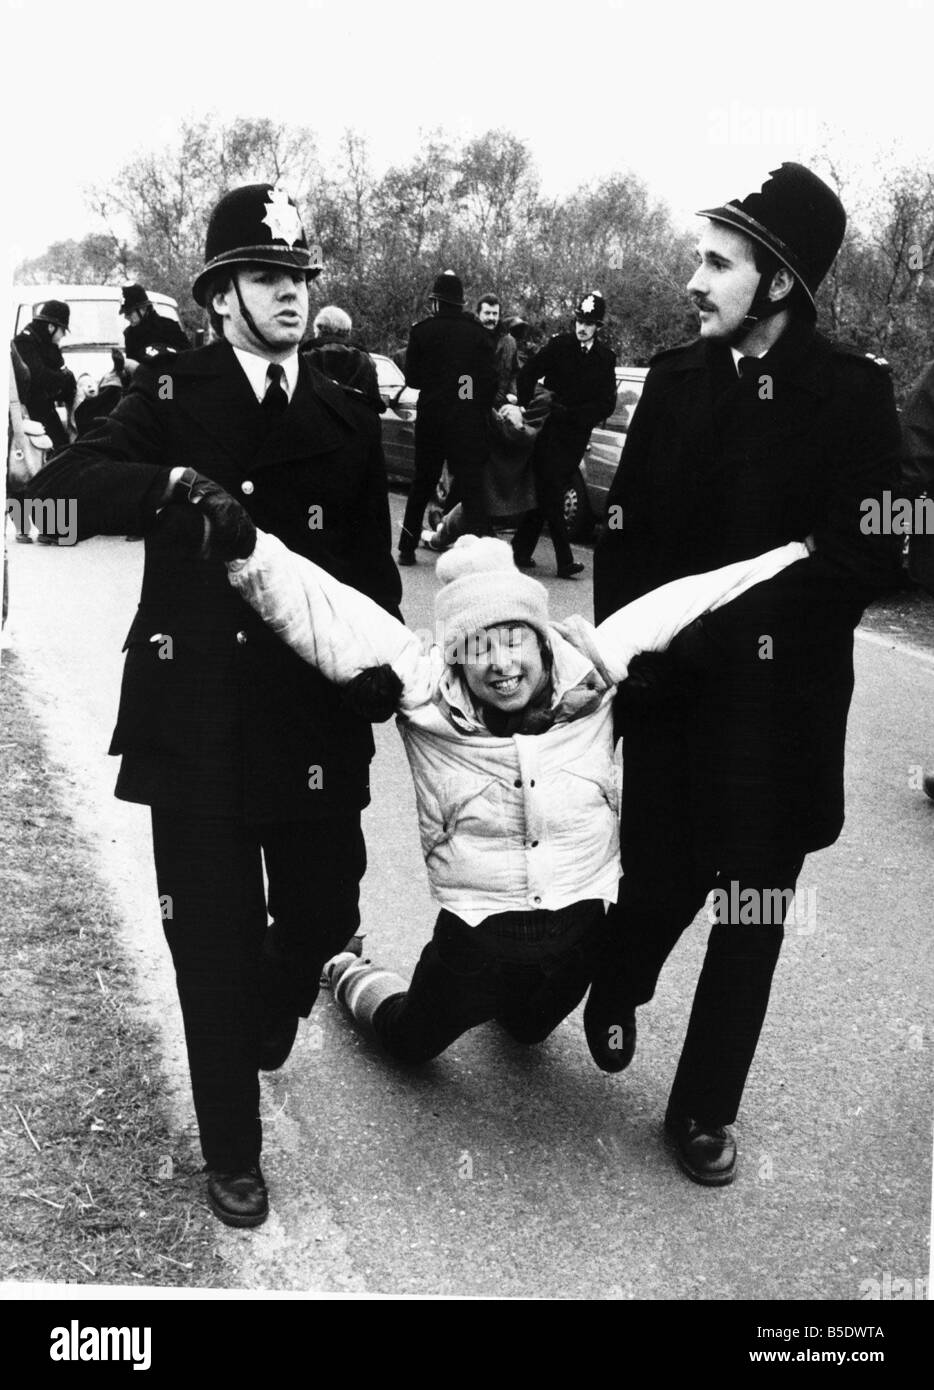 Polizei in Aktion ein Greenham Common Demonstrant festgenommen Stockbild